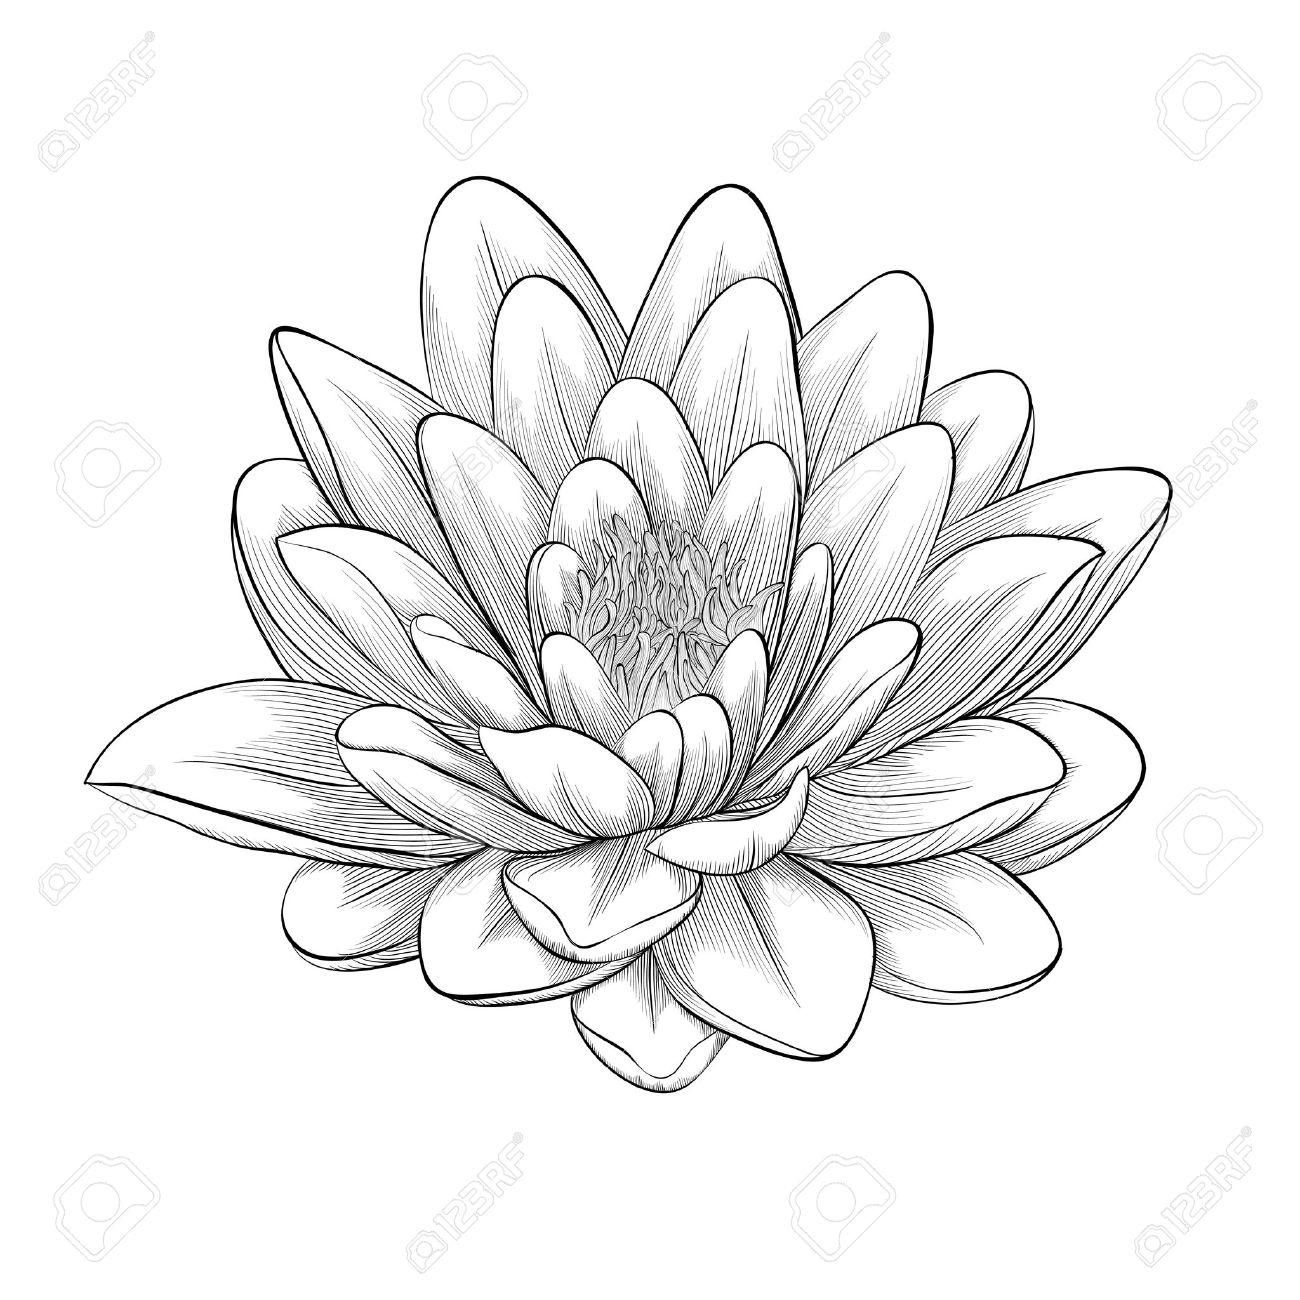 1300x1300 Lotus Flower Drawing Black And White Beautiful Monochrome, Black